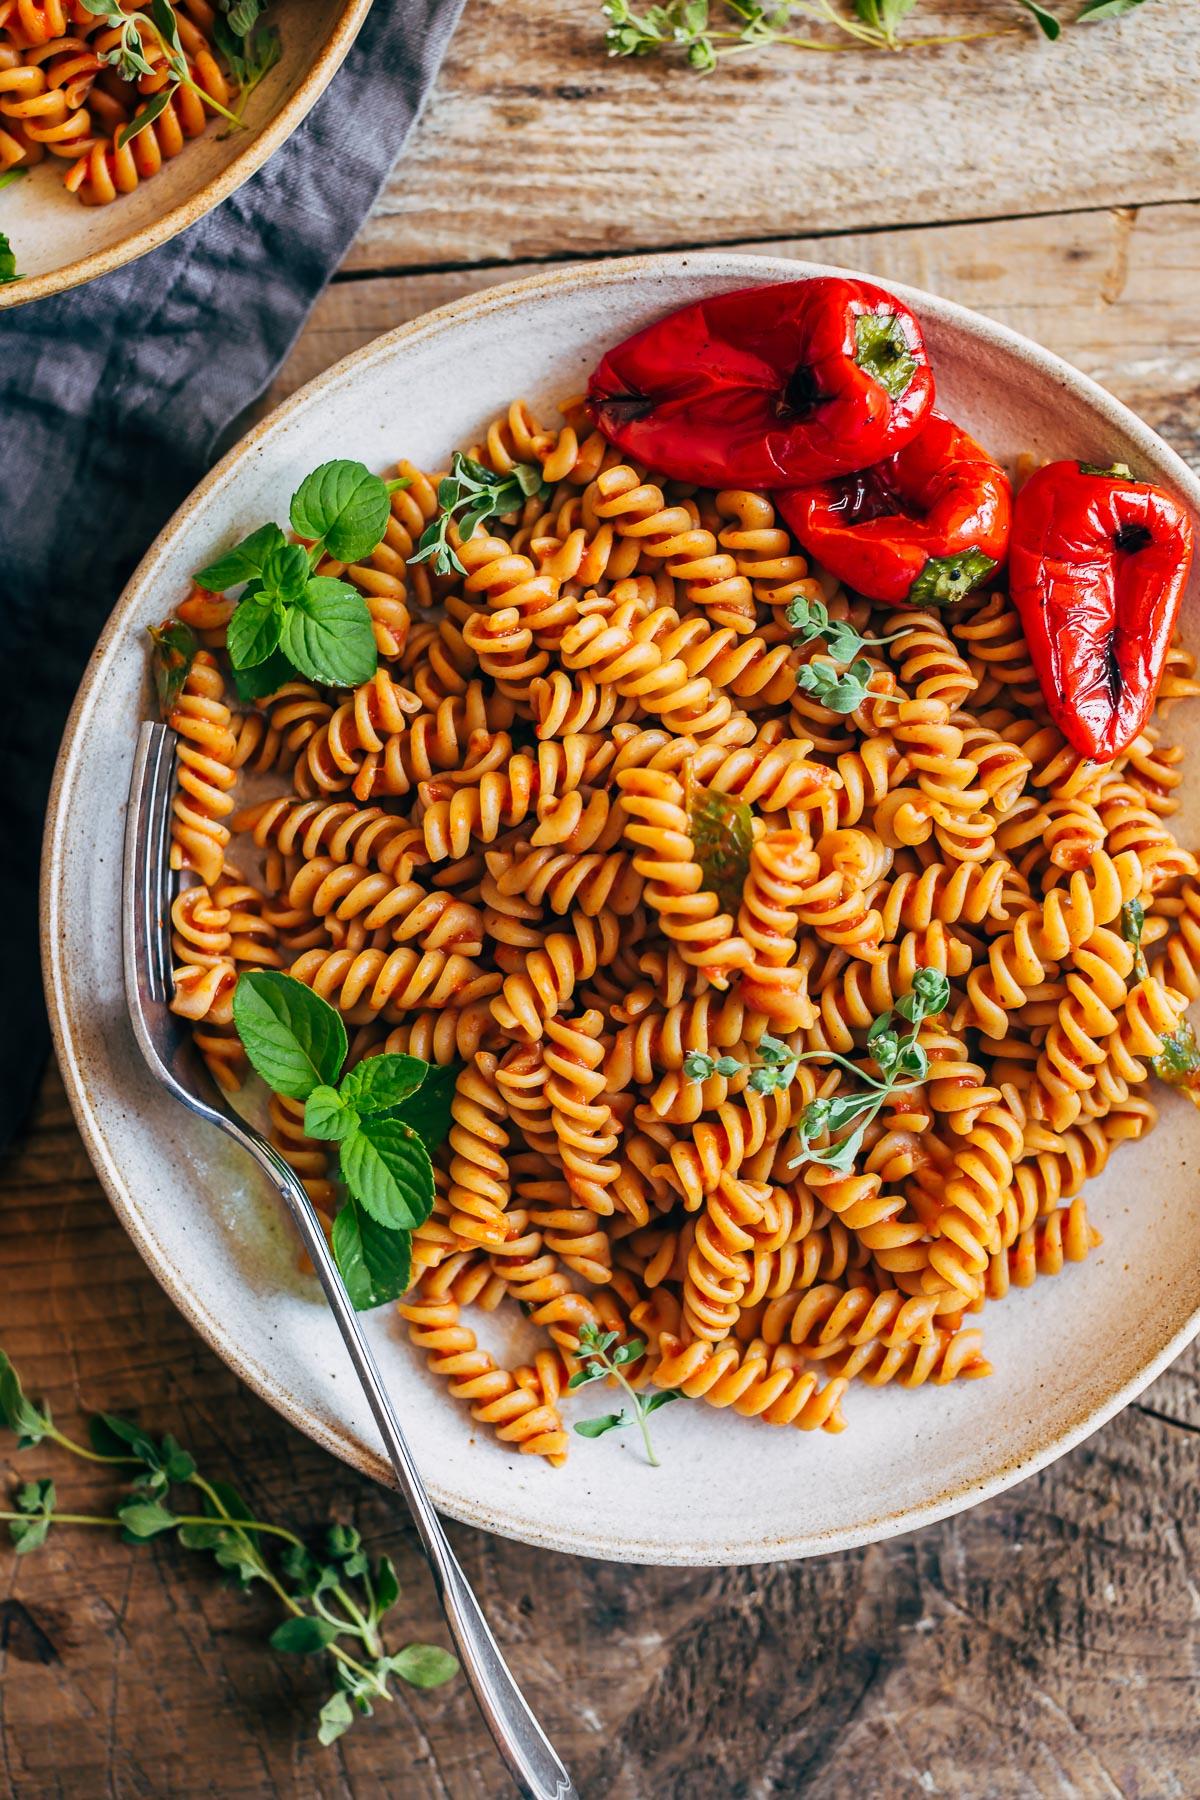 creamy vegan ROASTED RED PEPPER PASTA SAUCE cremosa pasta conSALSA ai PEPERONI arrostiti sensa glutine